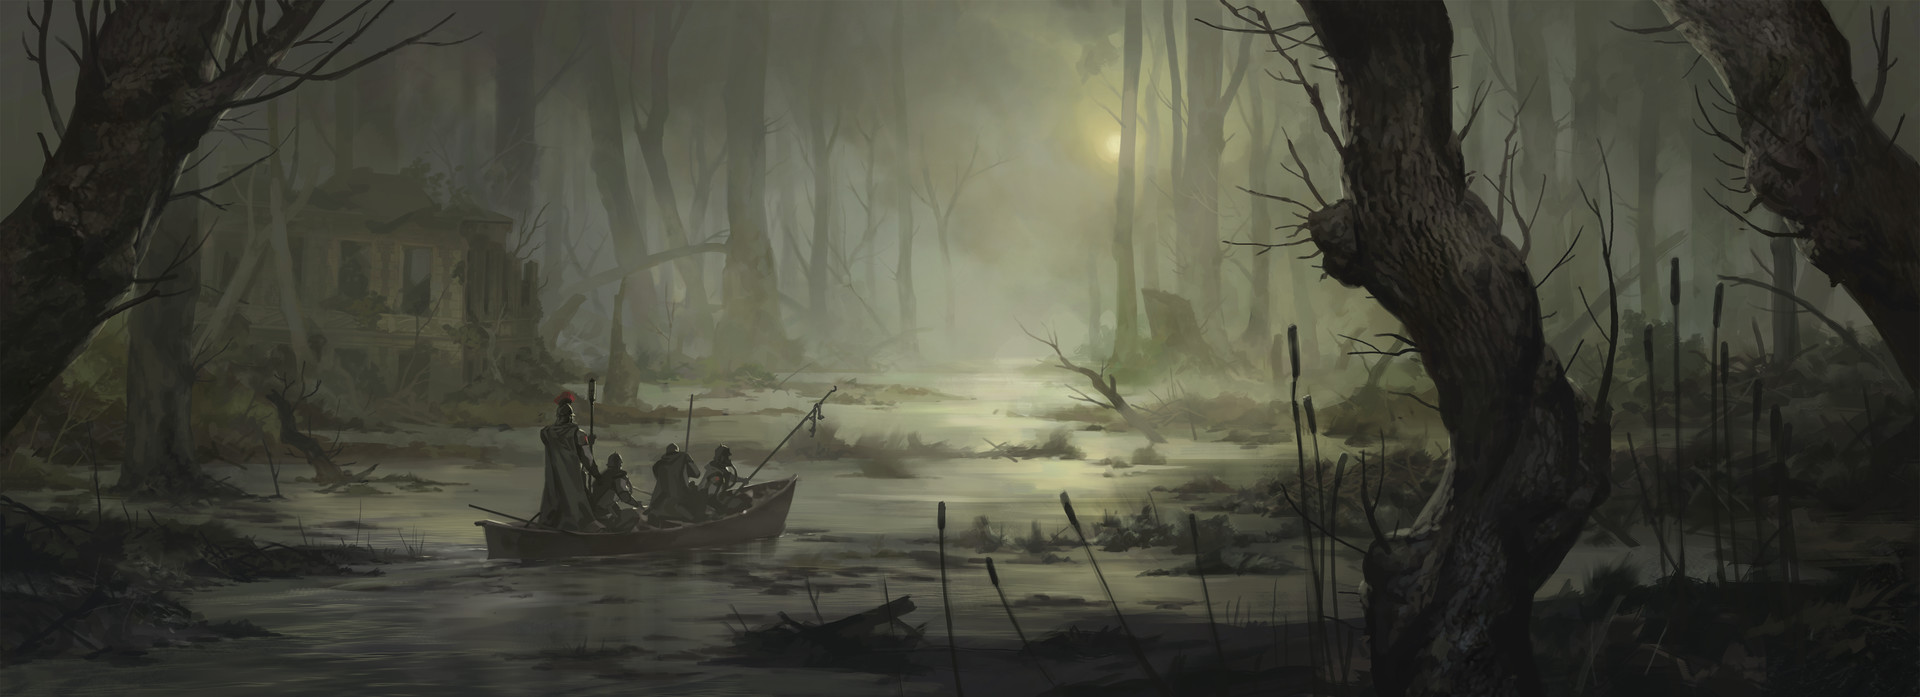 Sixmorevodka studio chapter 01 rhone swamps final bleed